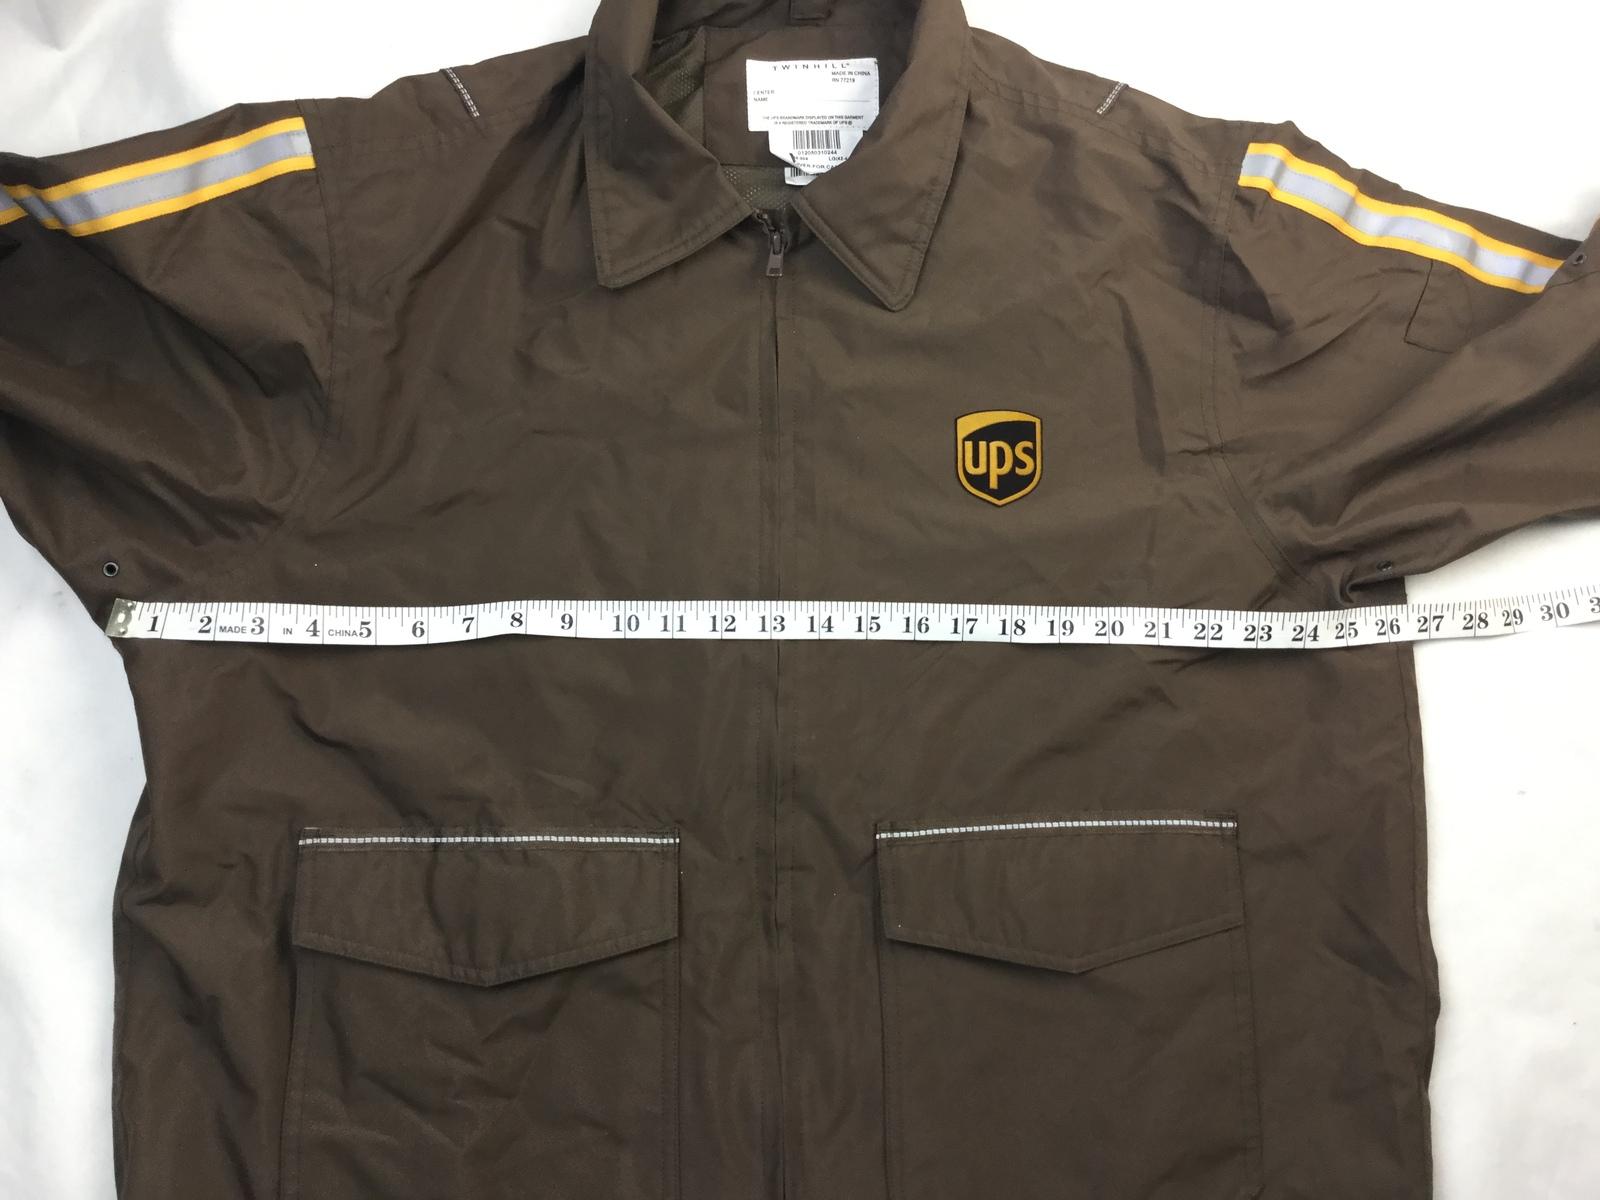 UPS Long Sleeve Full Zip Brown Rain Jacket Adult Men's Size L  (42-44) large  image 2